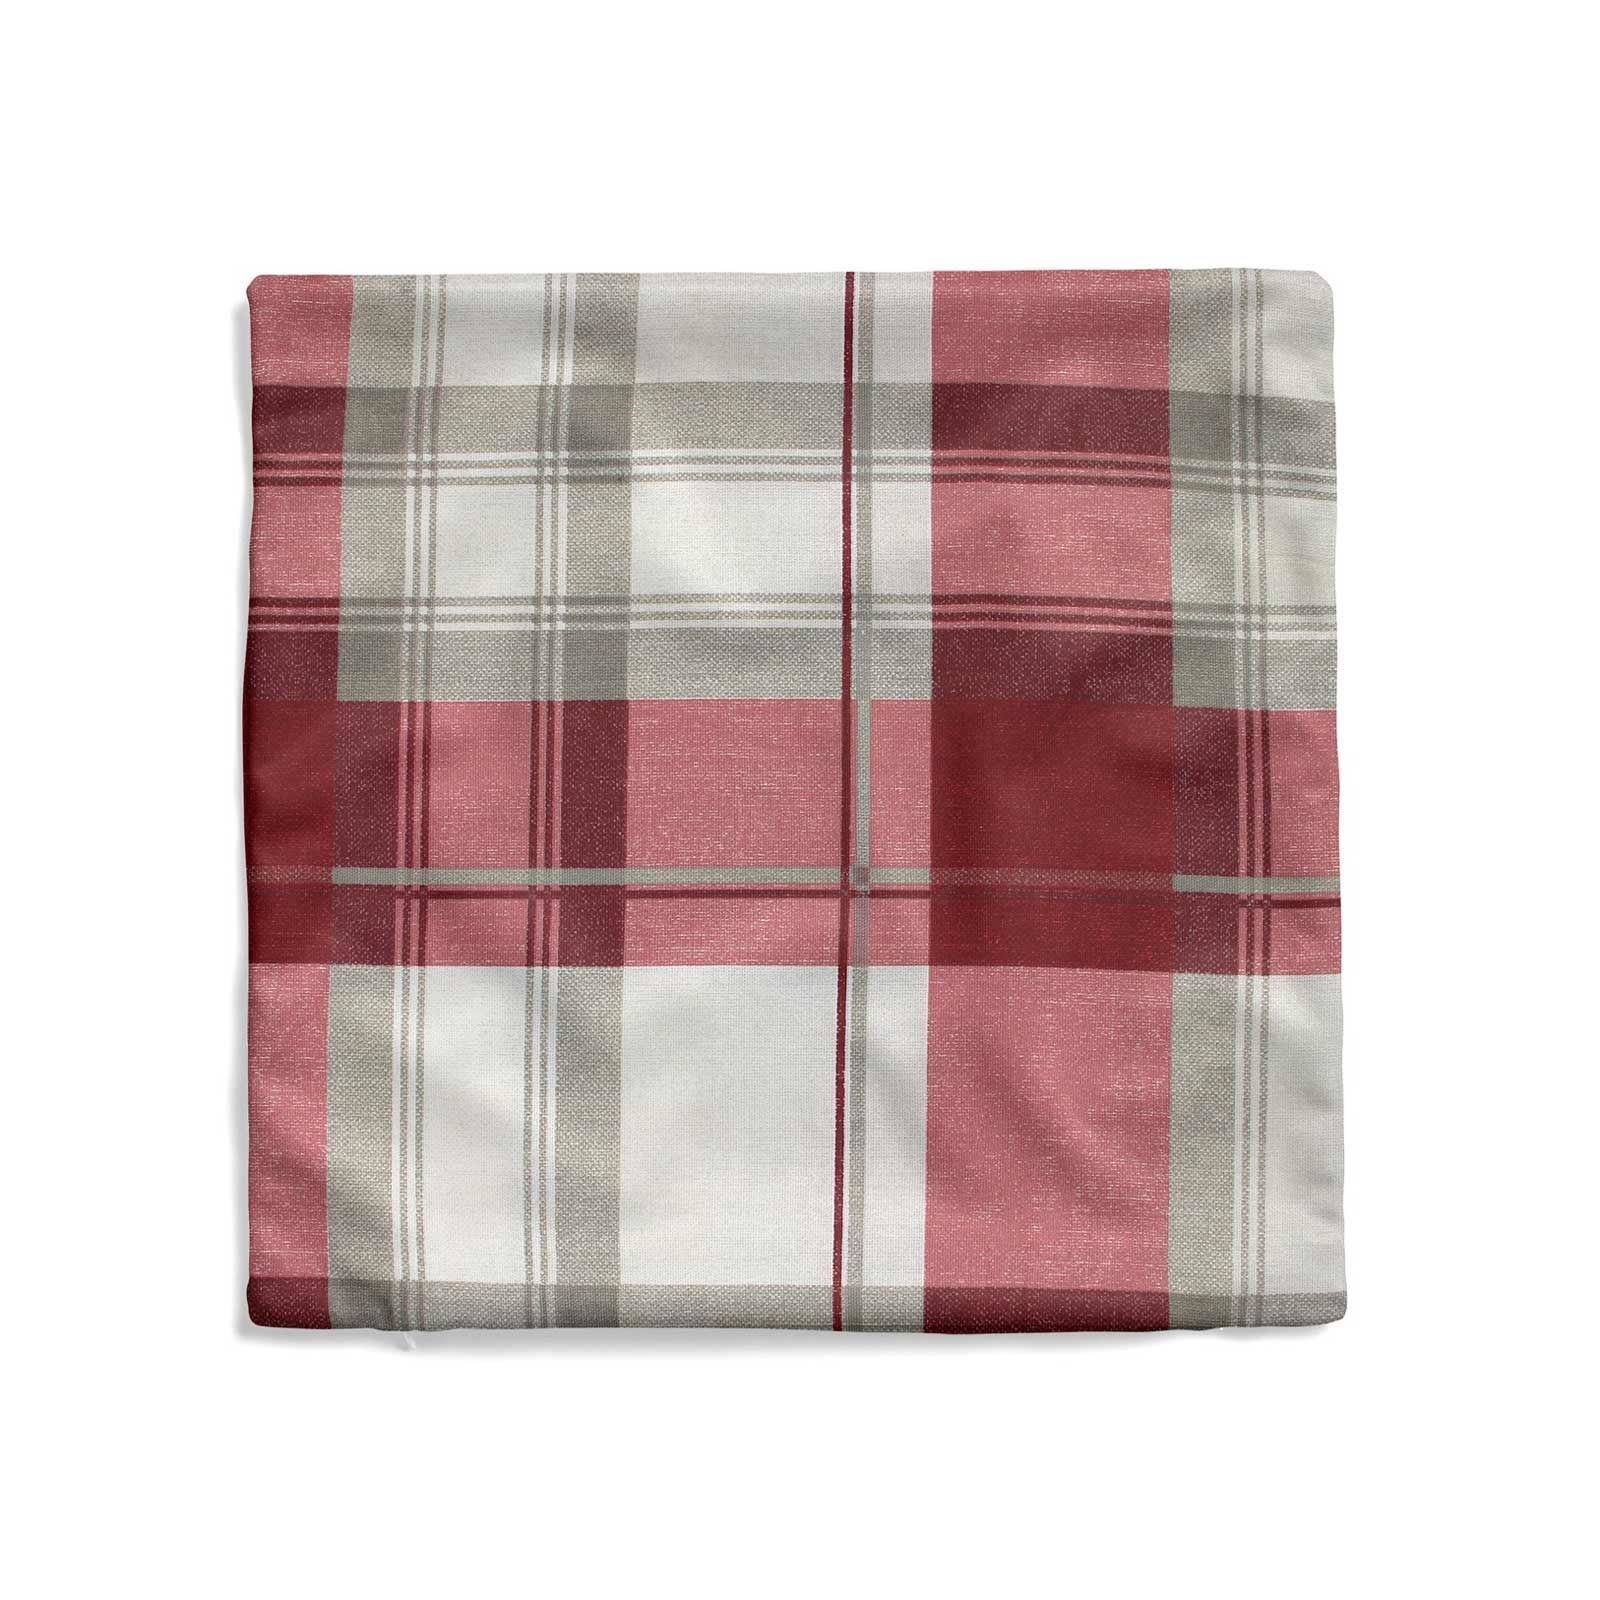 Vino-Tinto-Cushion-Covers-Coleccion-17-034-18-034-43cm-45cm-Cubierta miniatura 40